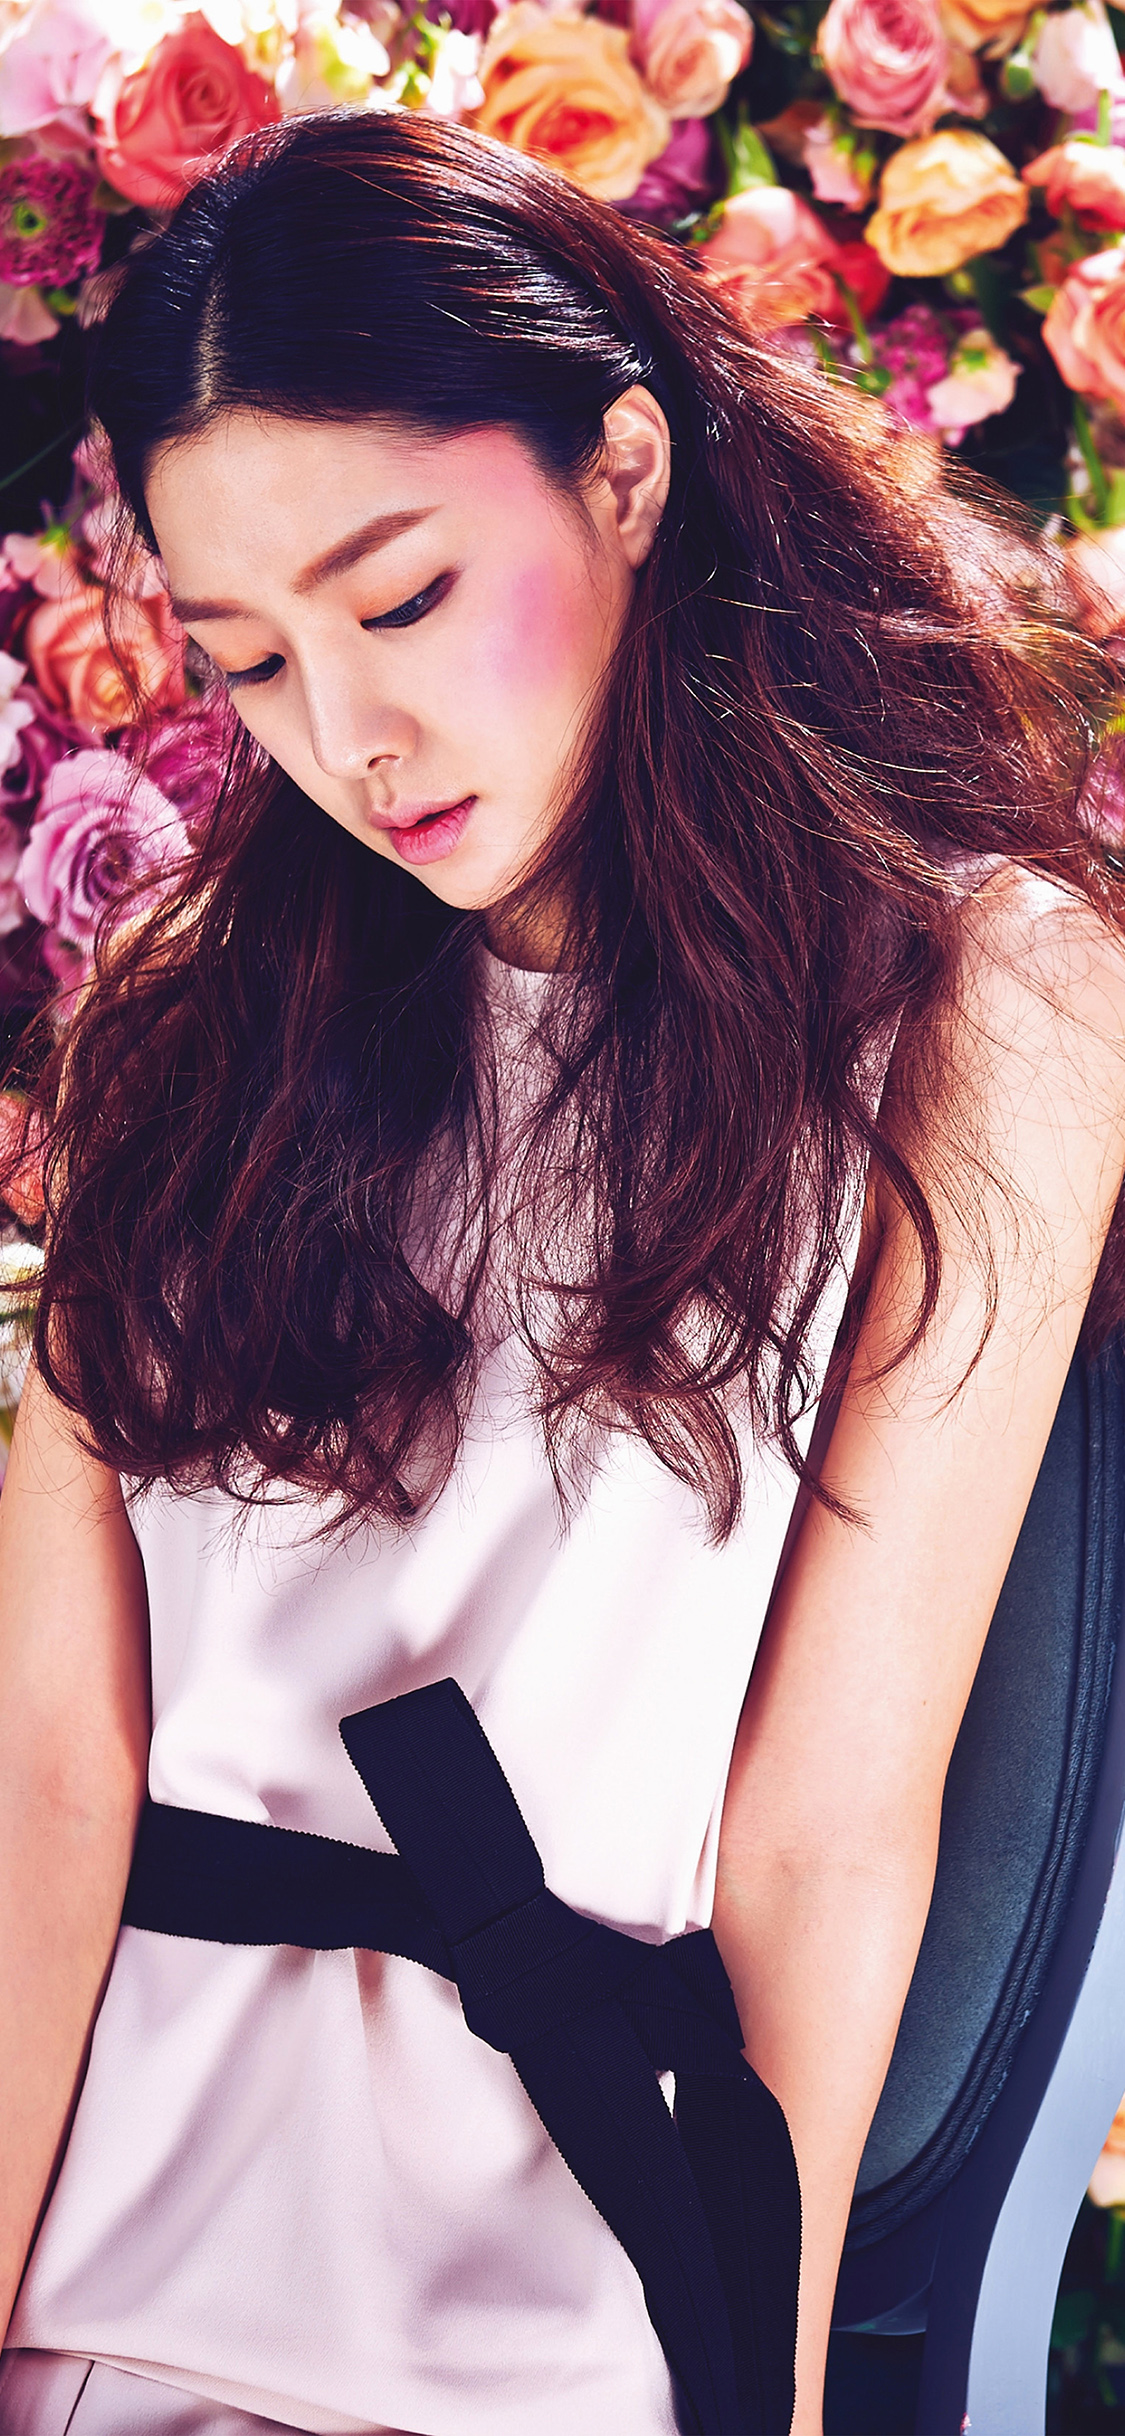 iPhoneXpapers.com-Apple-iPhone-wallpaper-hi52-spring-kpop-flower-art-model